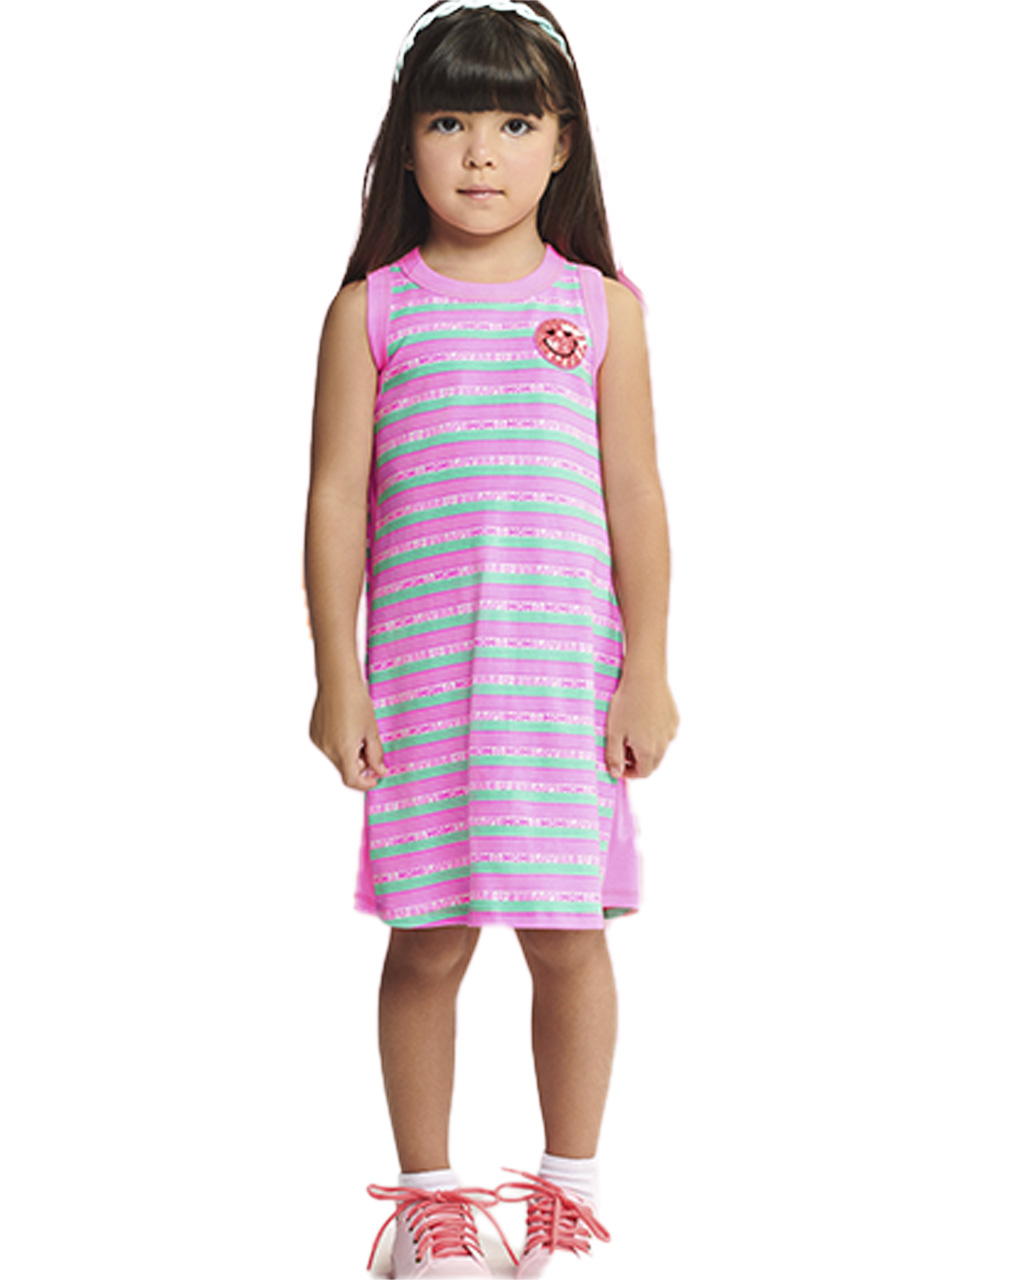 Vestido Infantil Listrado Rosa Momi